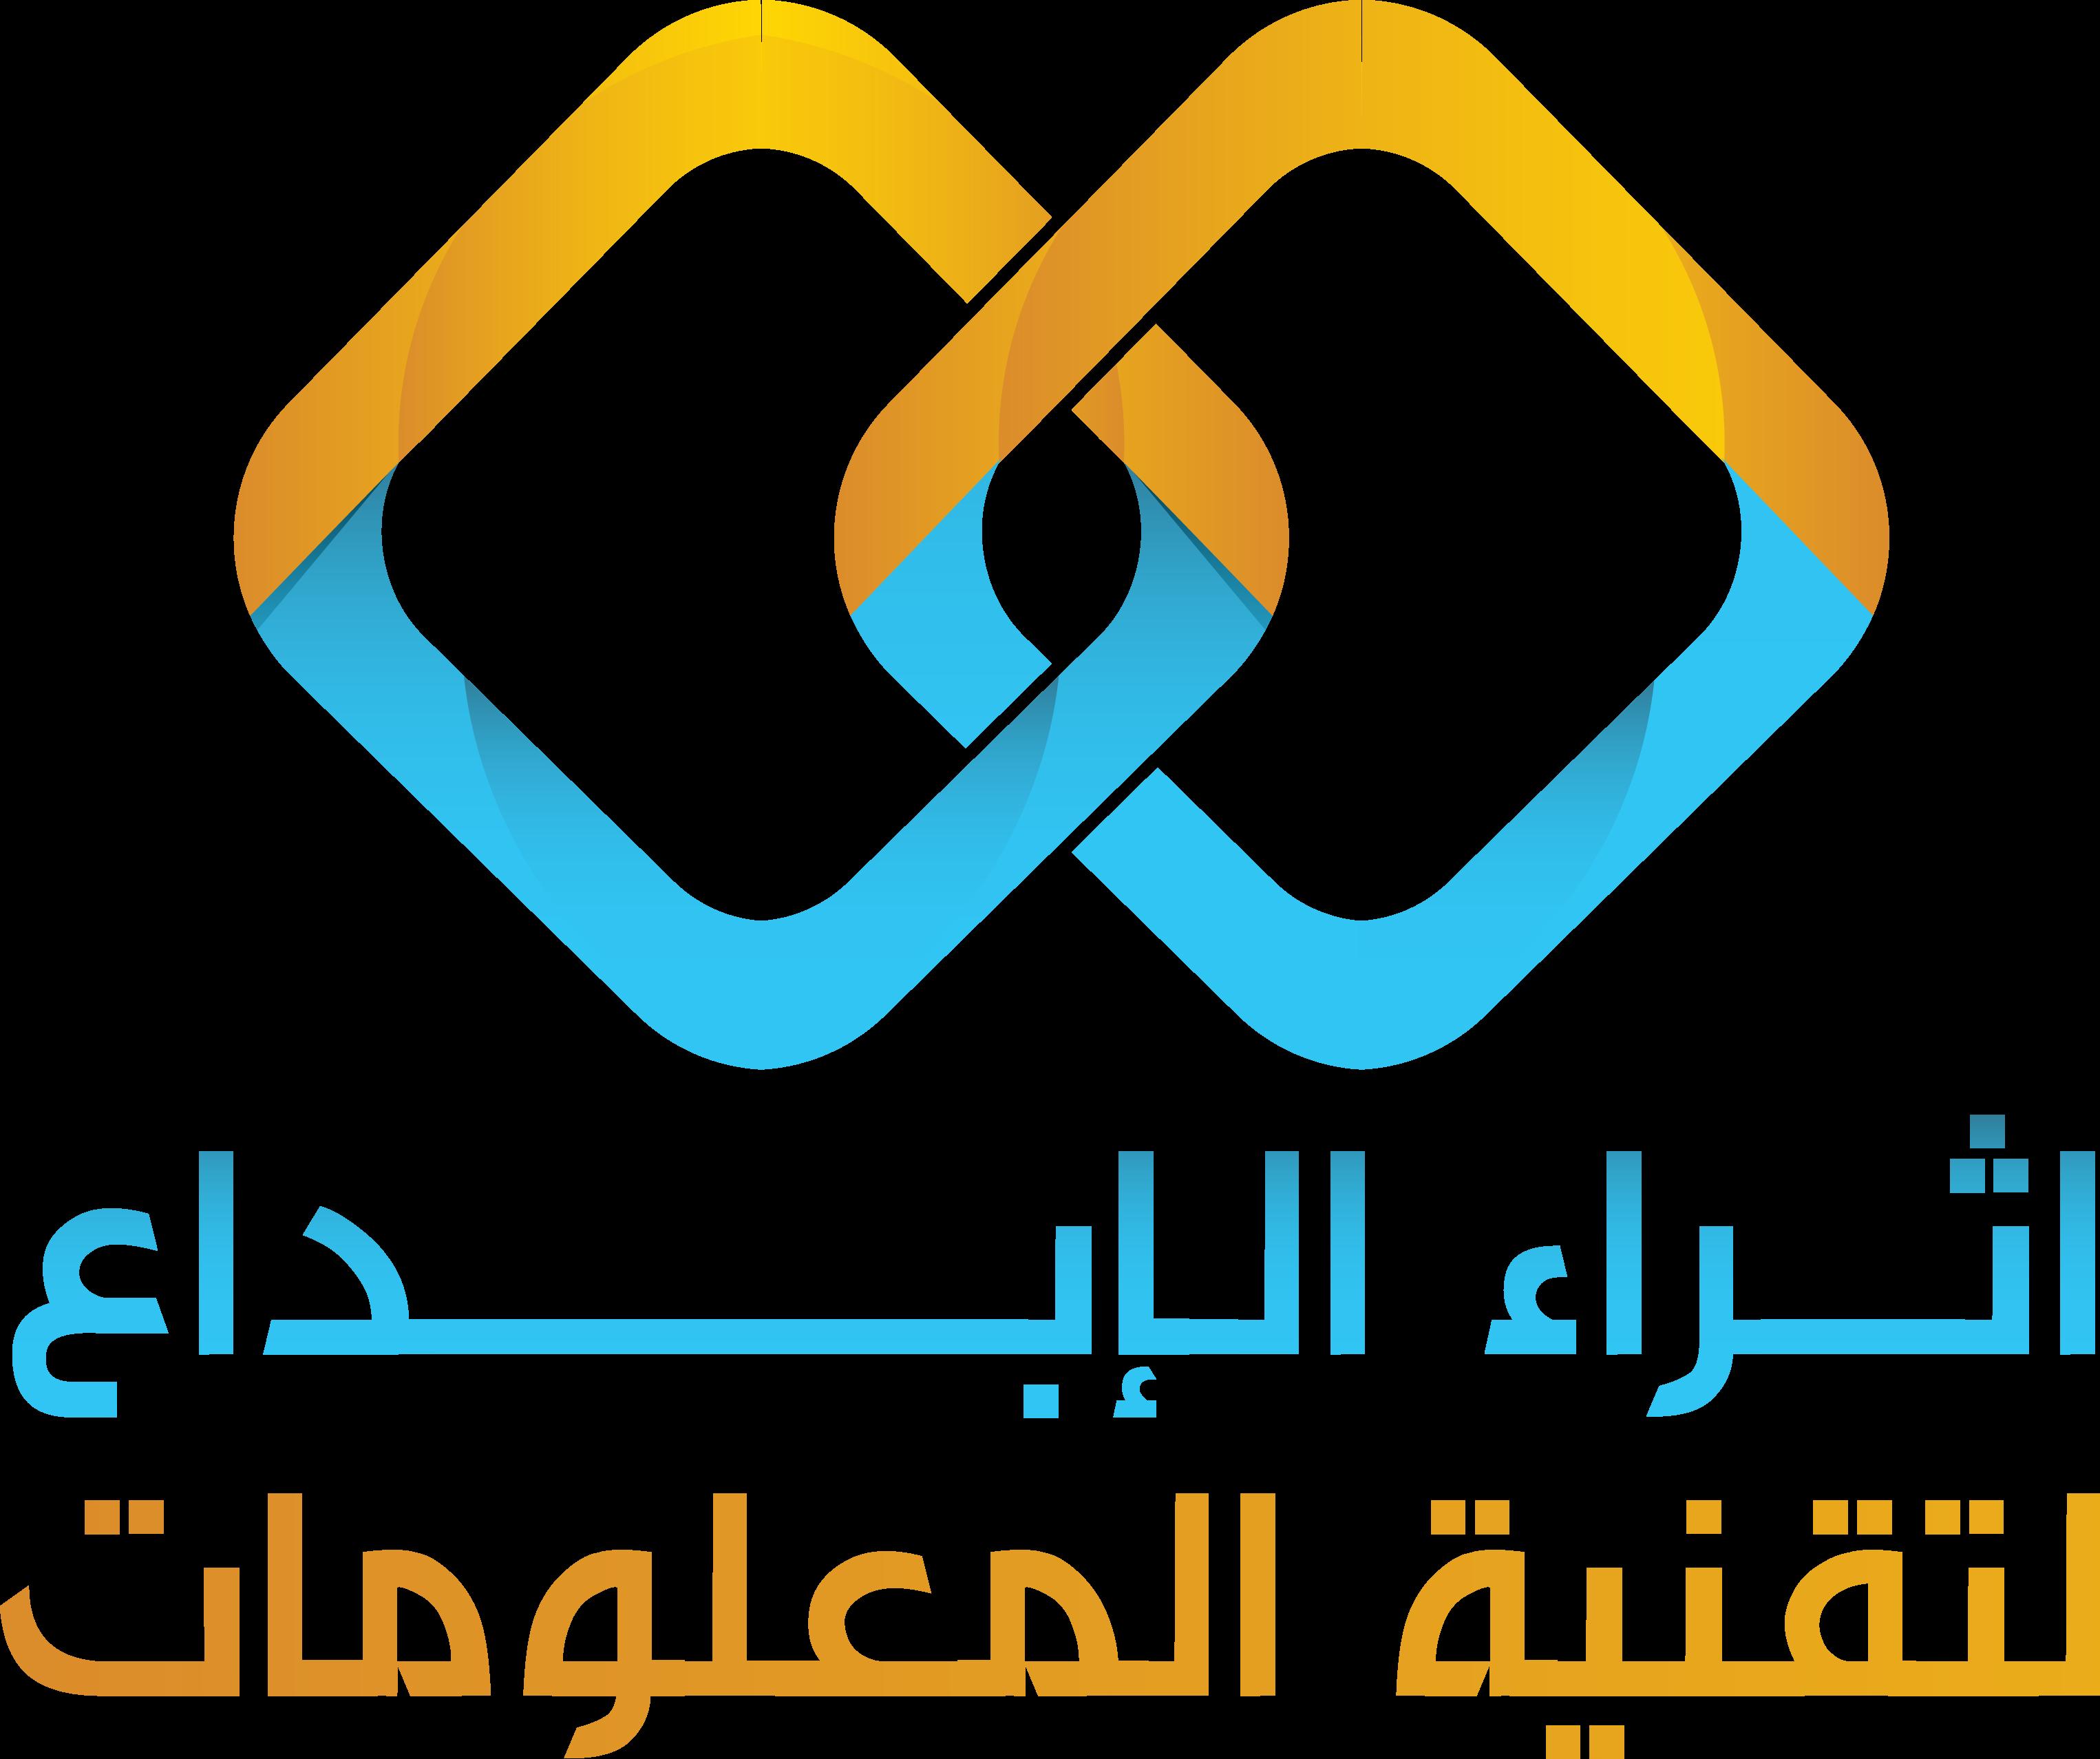 ethra logo